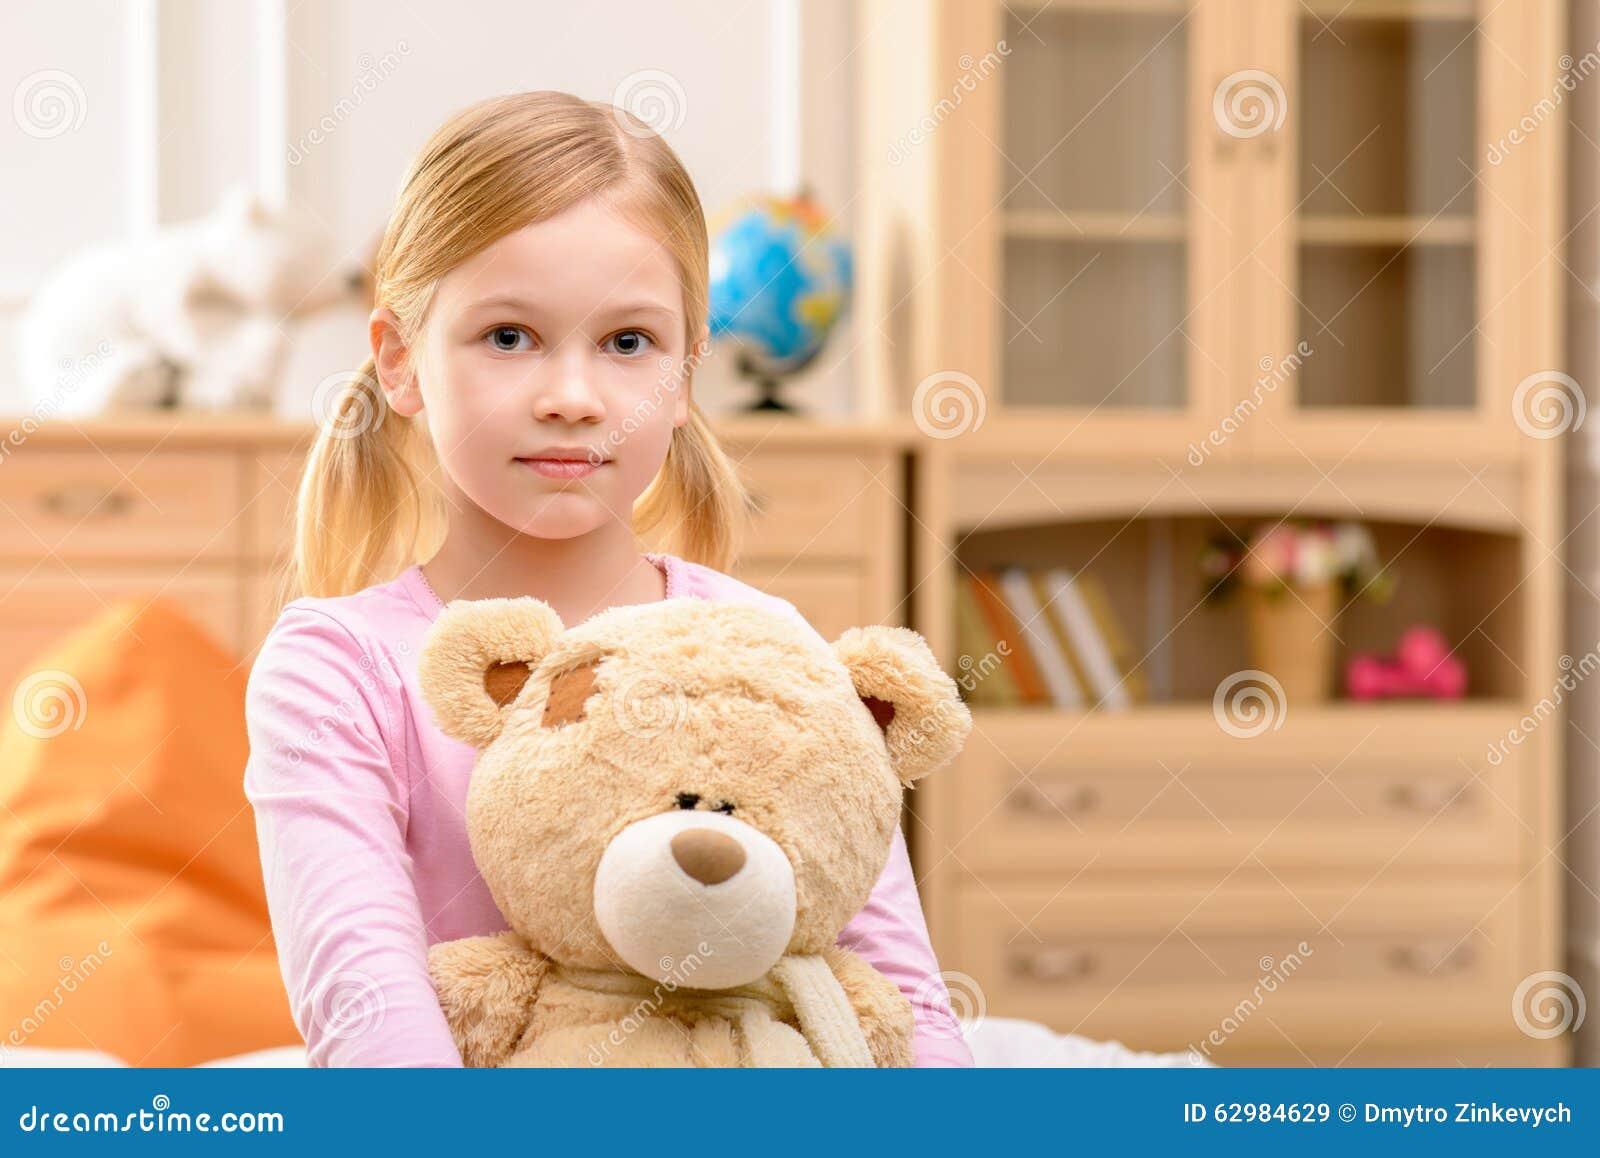 Pleasant girl holding bear